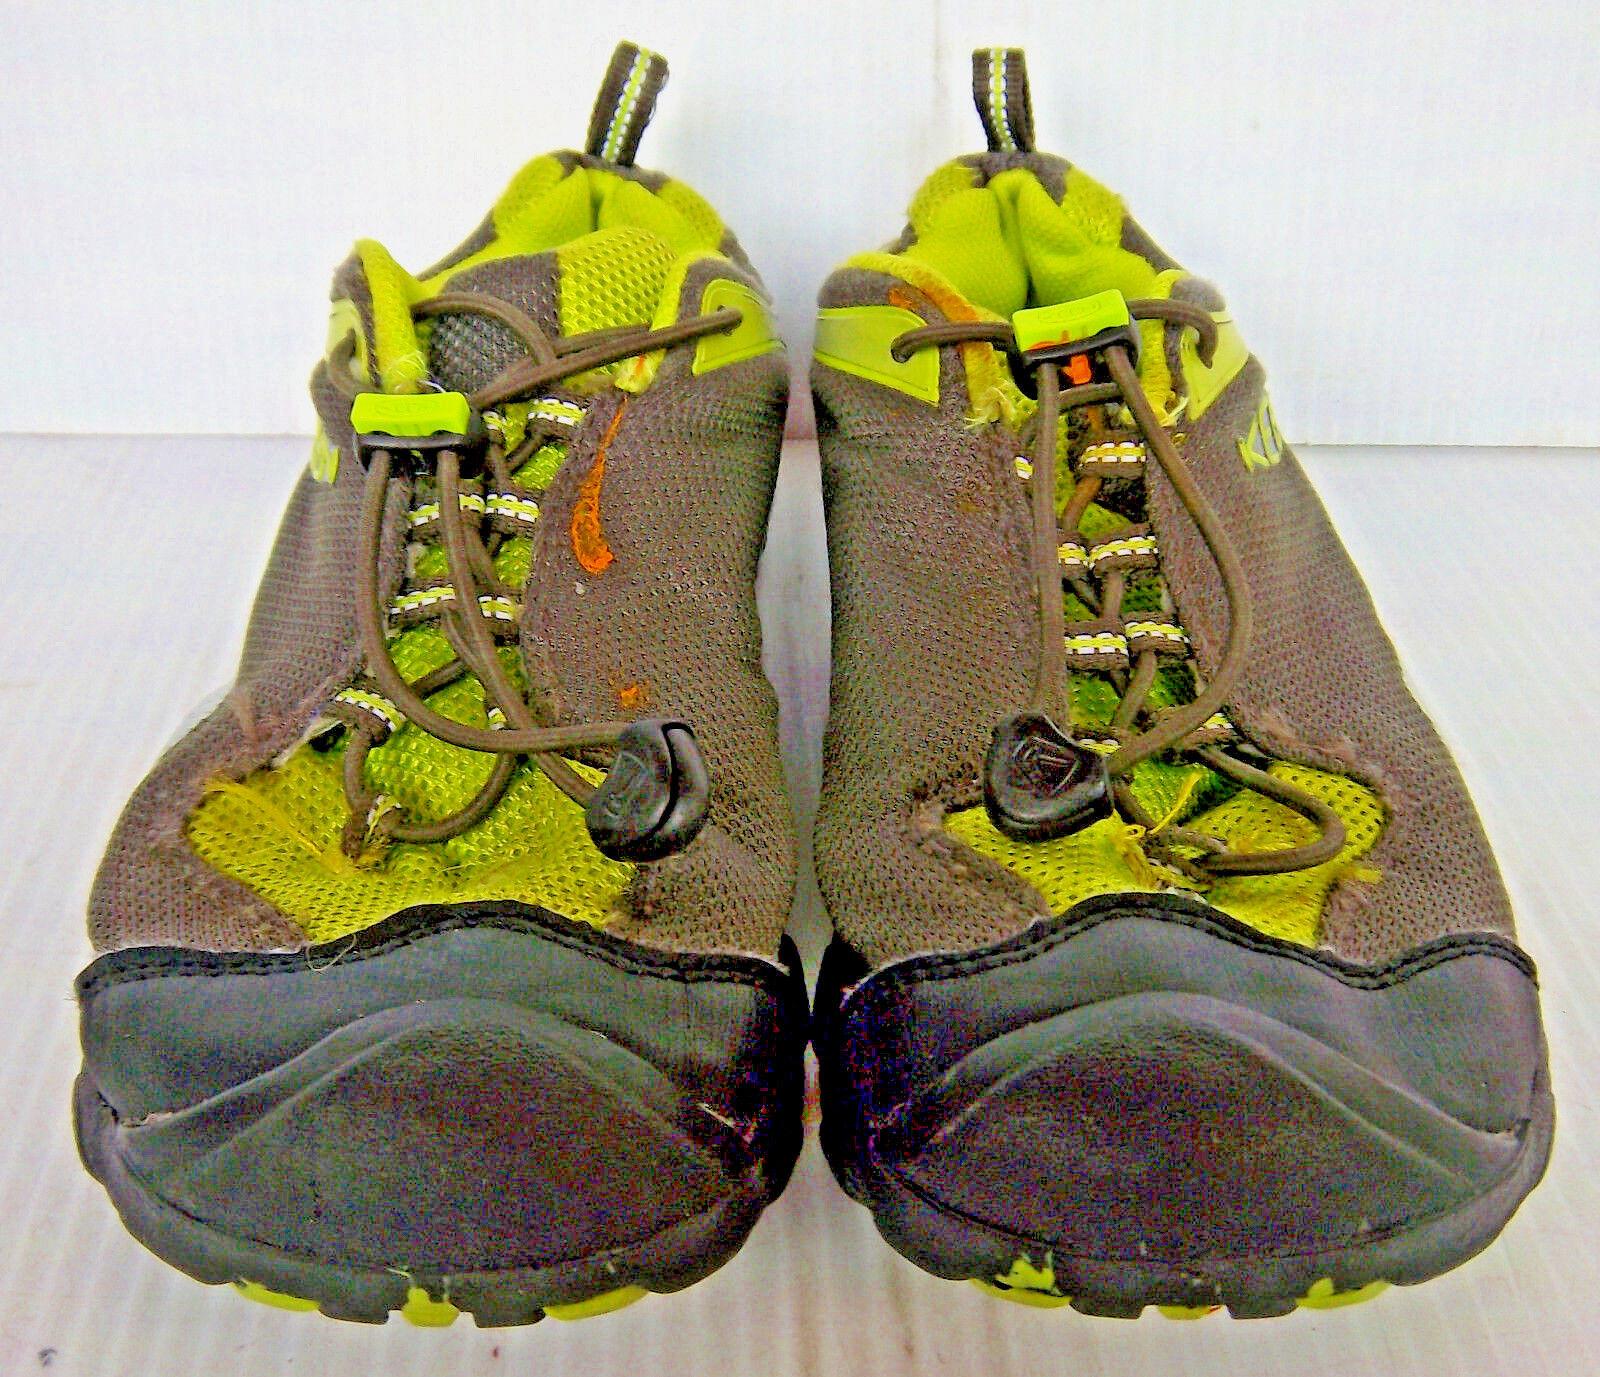 d261ad862ca KEEN - Men s Men s Men s Charcoal Gray   Green Mesh Dry Hiking Trail  Sneakers -- Size 6 6f6c45